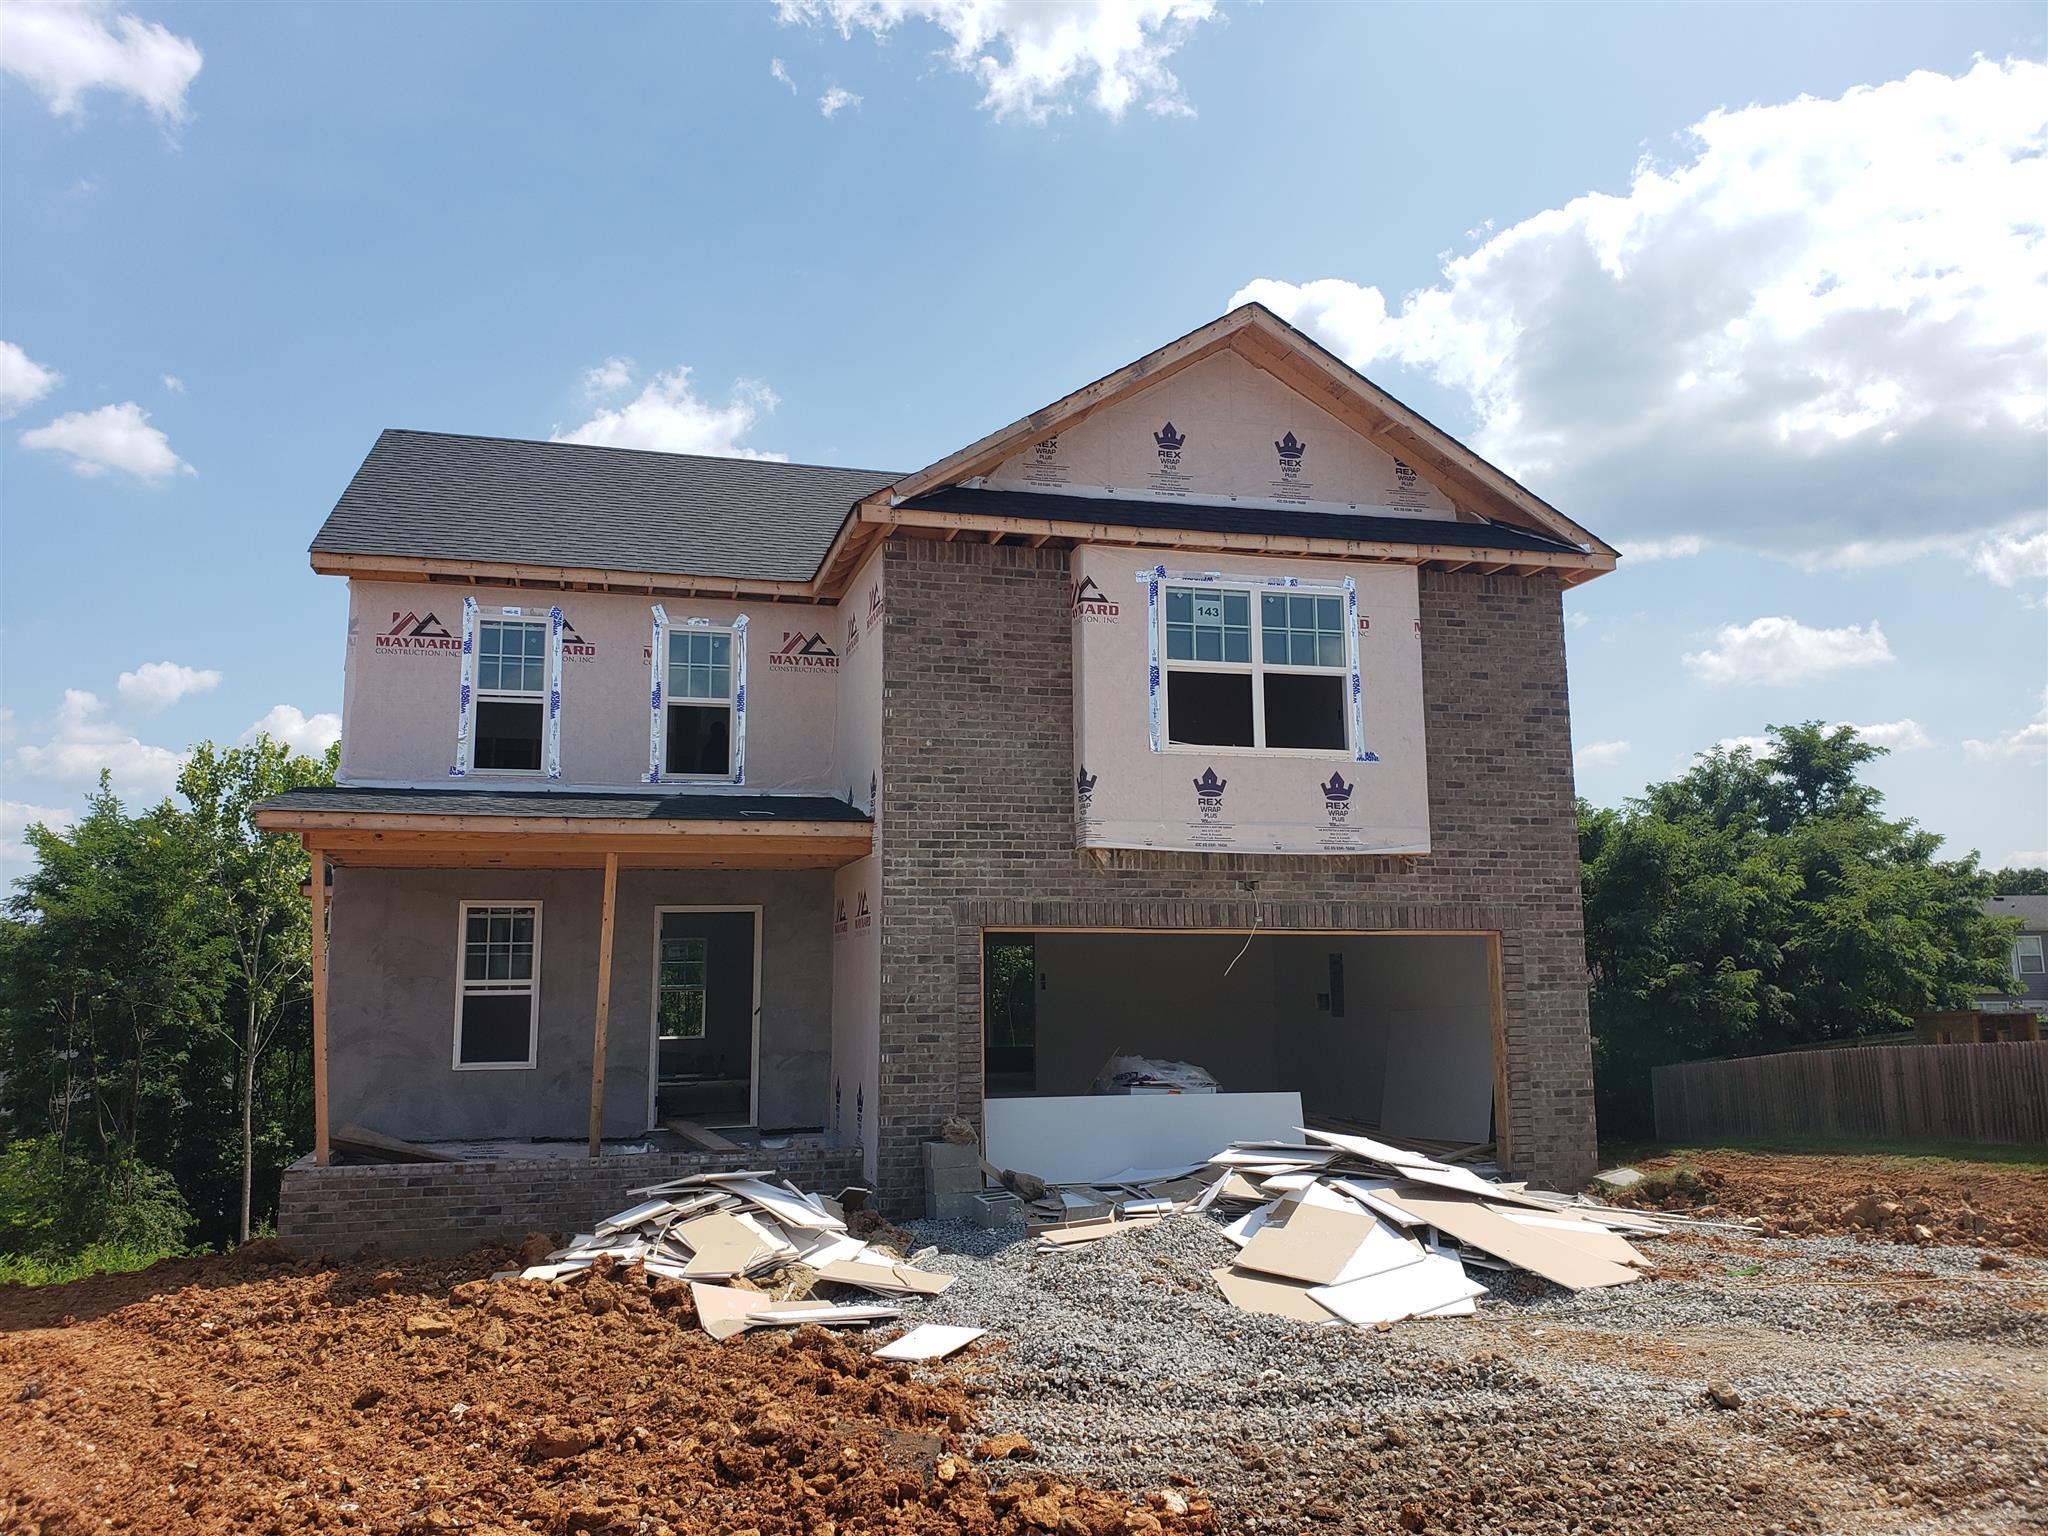 840 Crestone Ln (Lot 143), Clarksville, TN 37042 - Clarksville, TN real estate listing